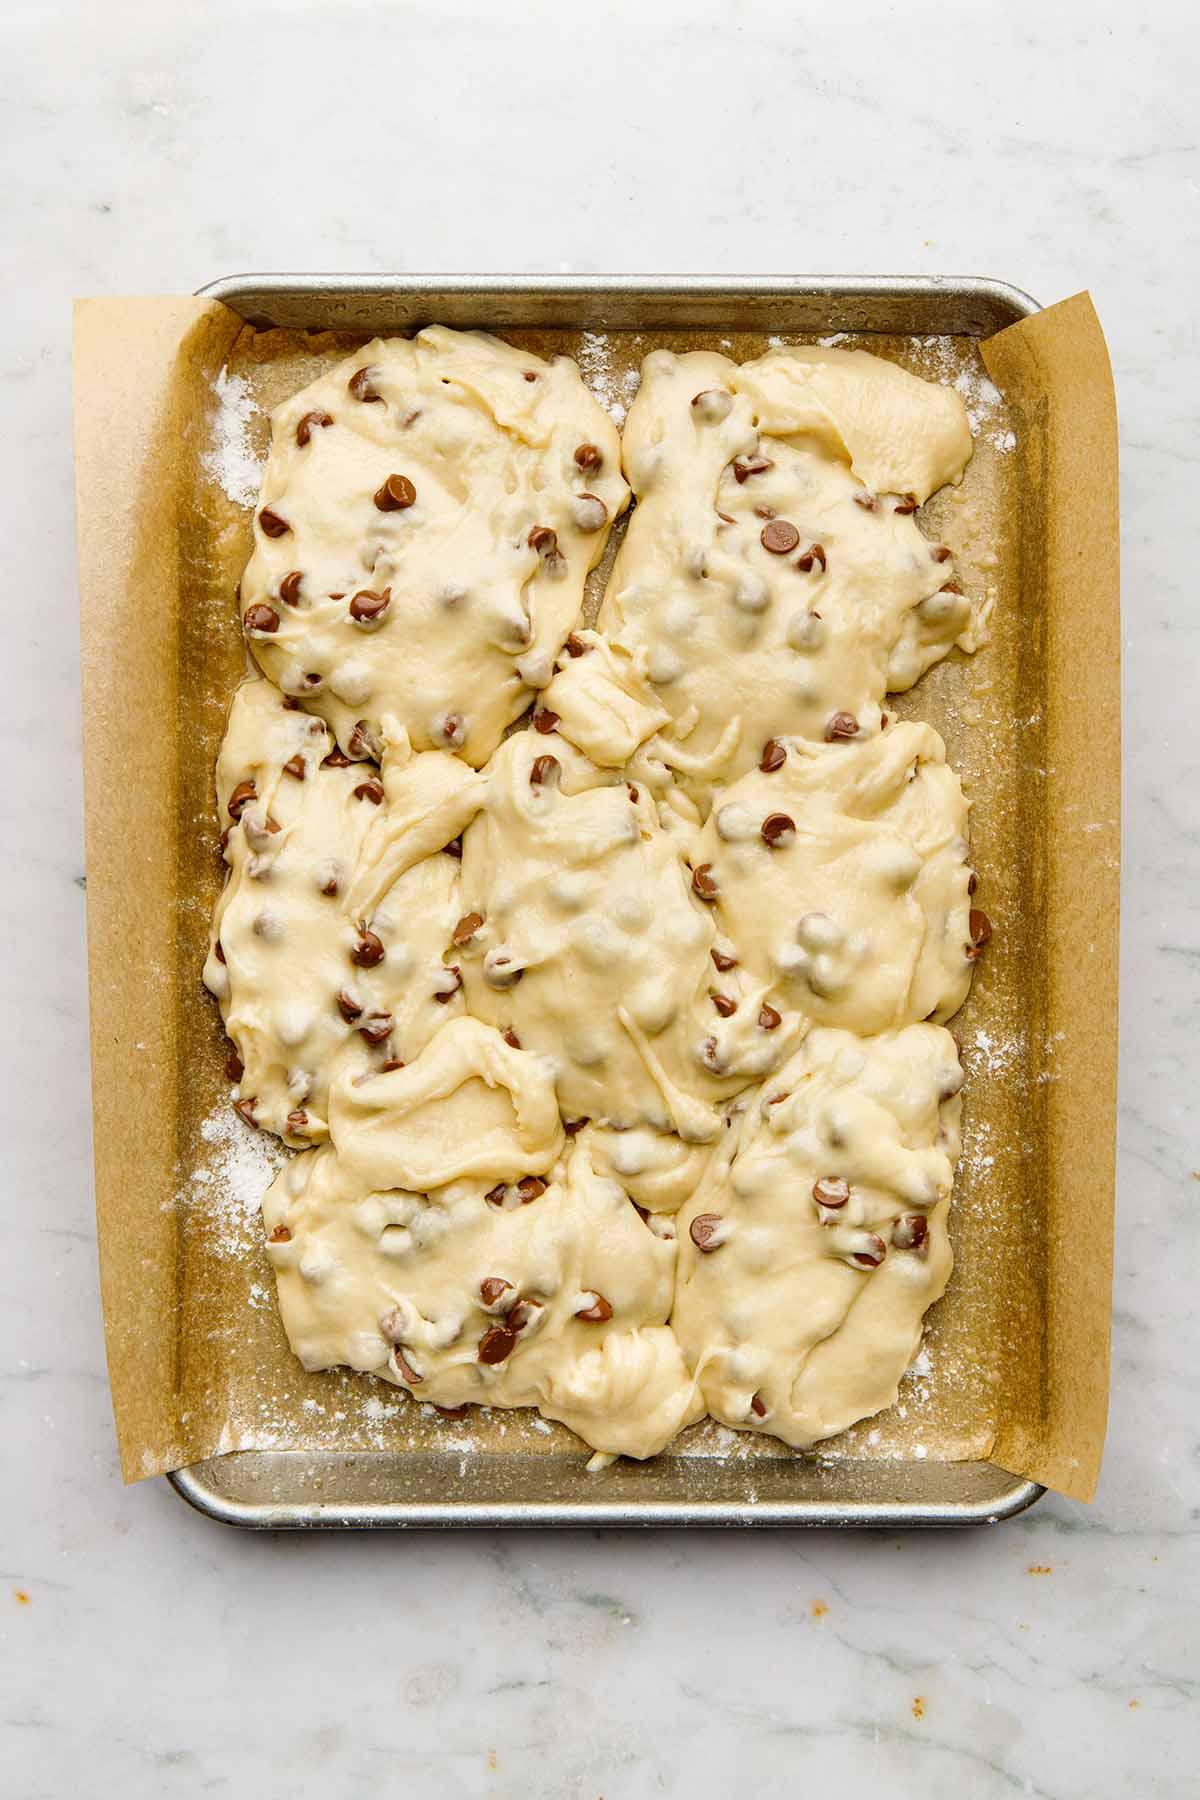 Dollops of cake batter in a pan.